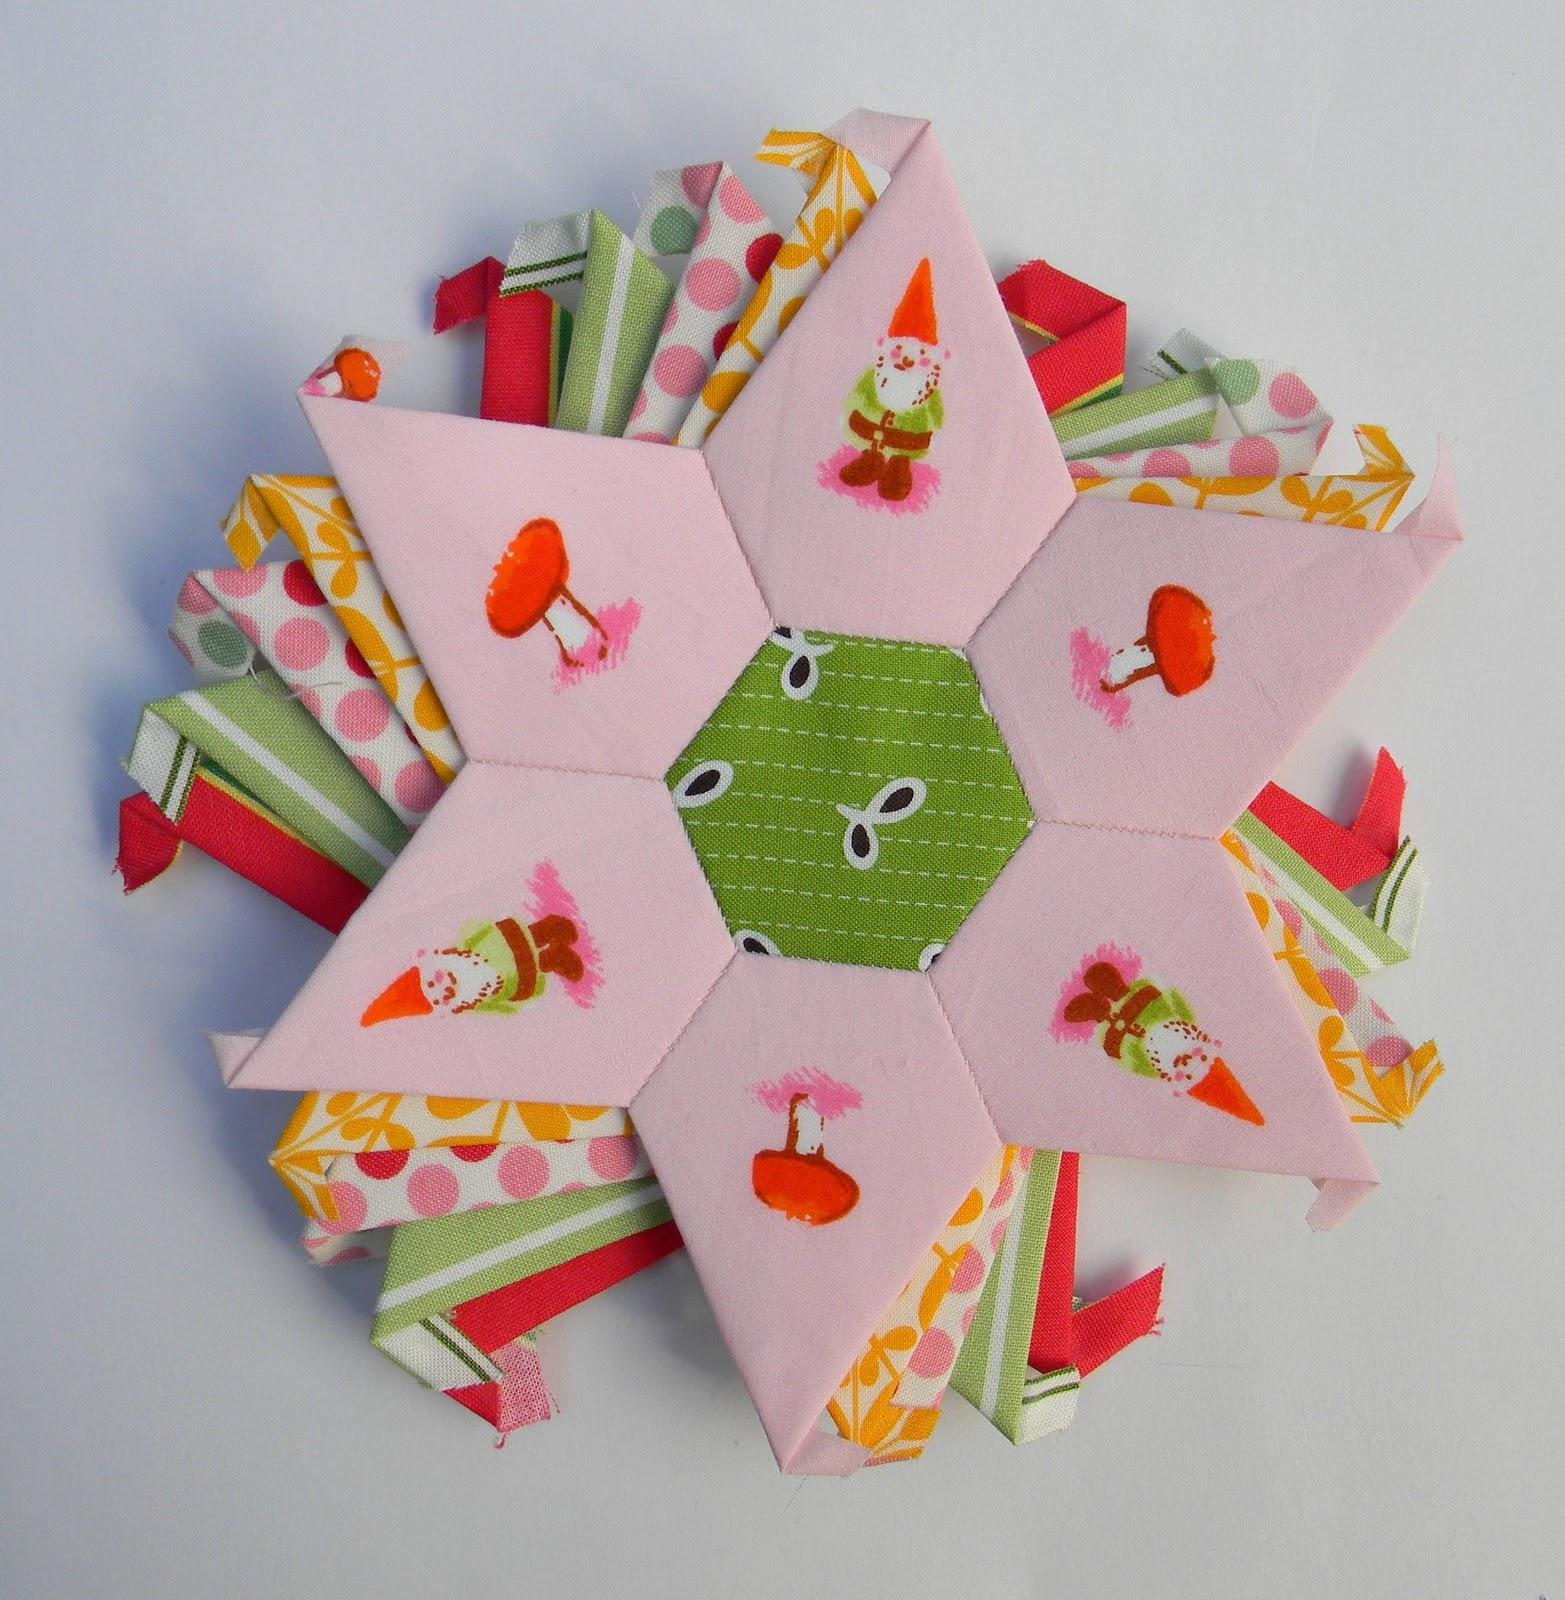 teaginny designs  a return to paper piecing